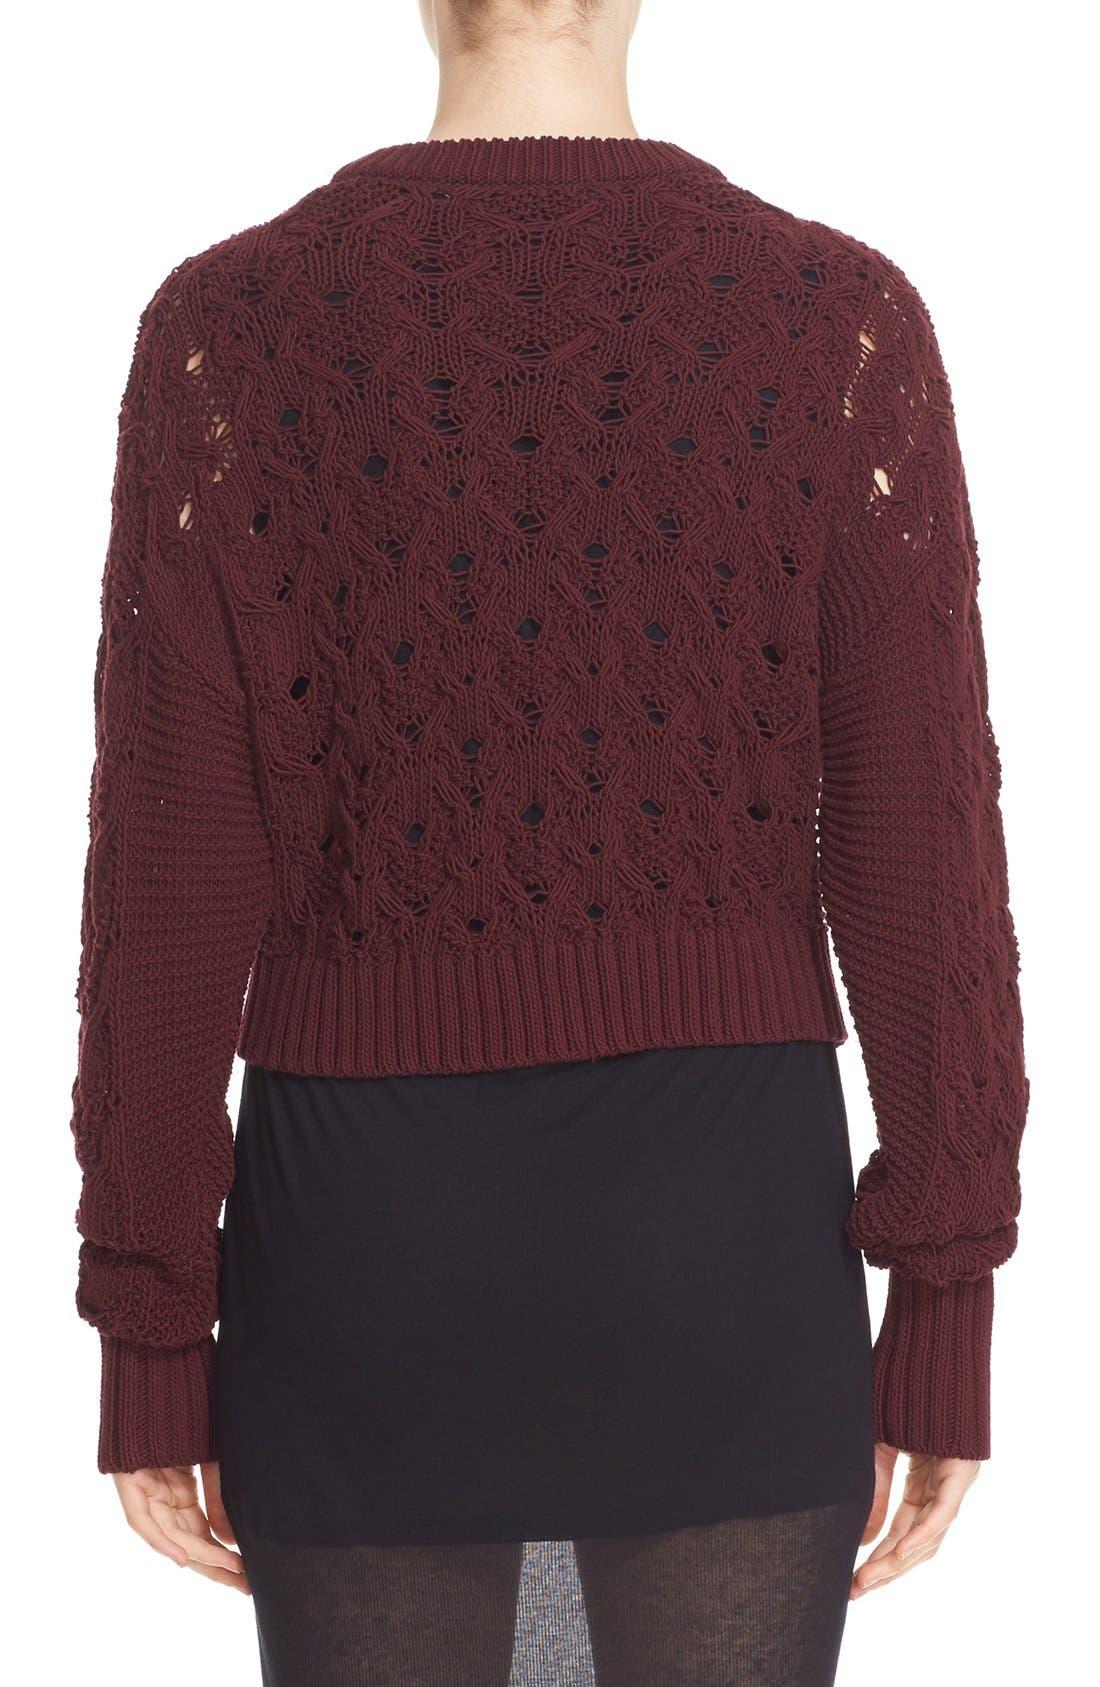 Alternate Image 3  - Public School Cotton Blend Cable Knit Sweater